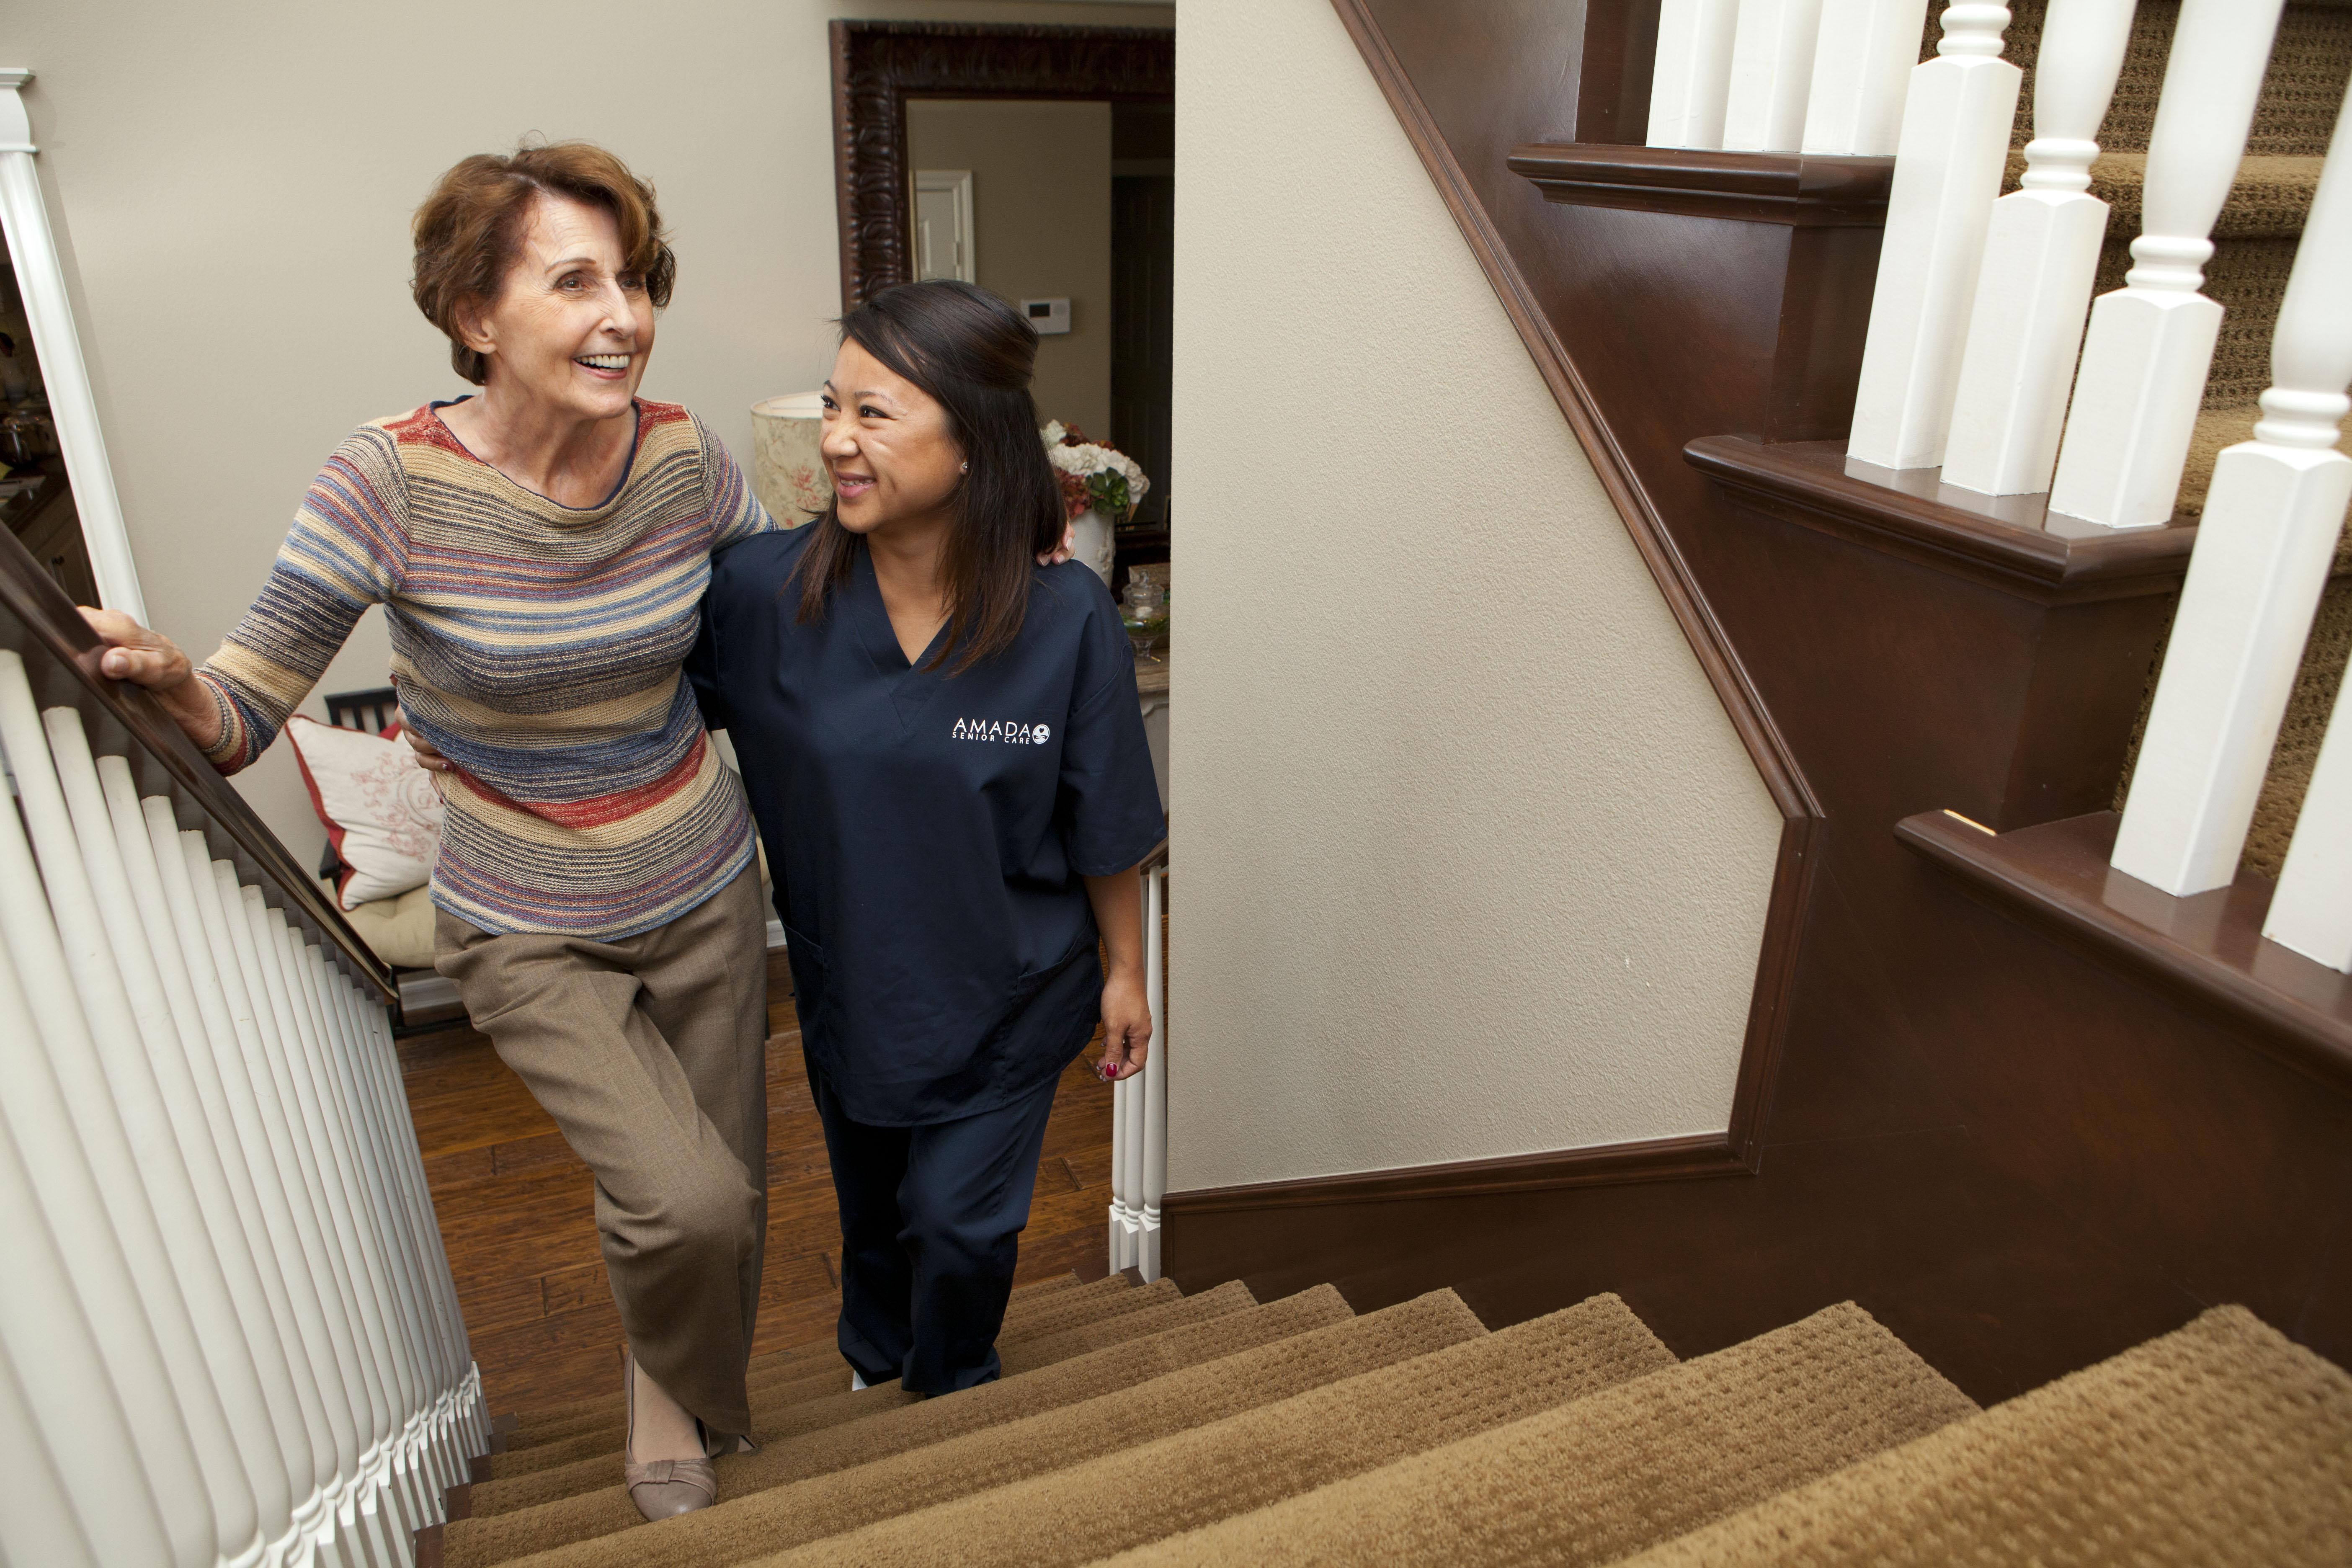 Amada Senior Care Central Minneapolis   11204 86th Ave N, Maple Grove, MN, 55369   +1 (612) 470-0105